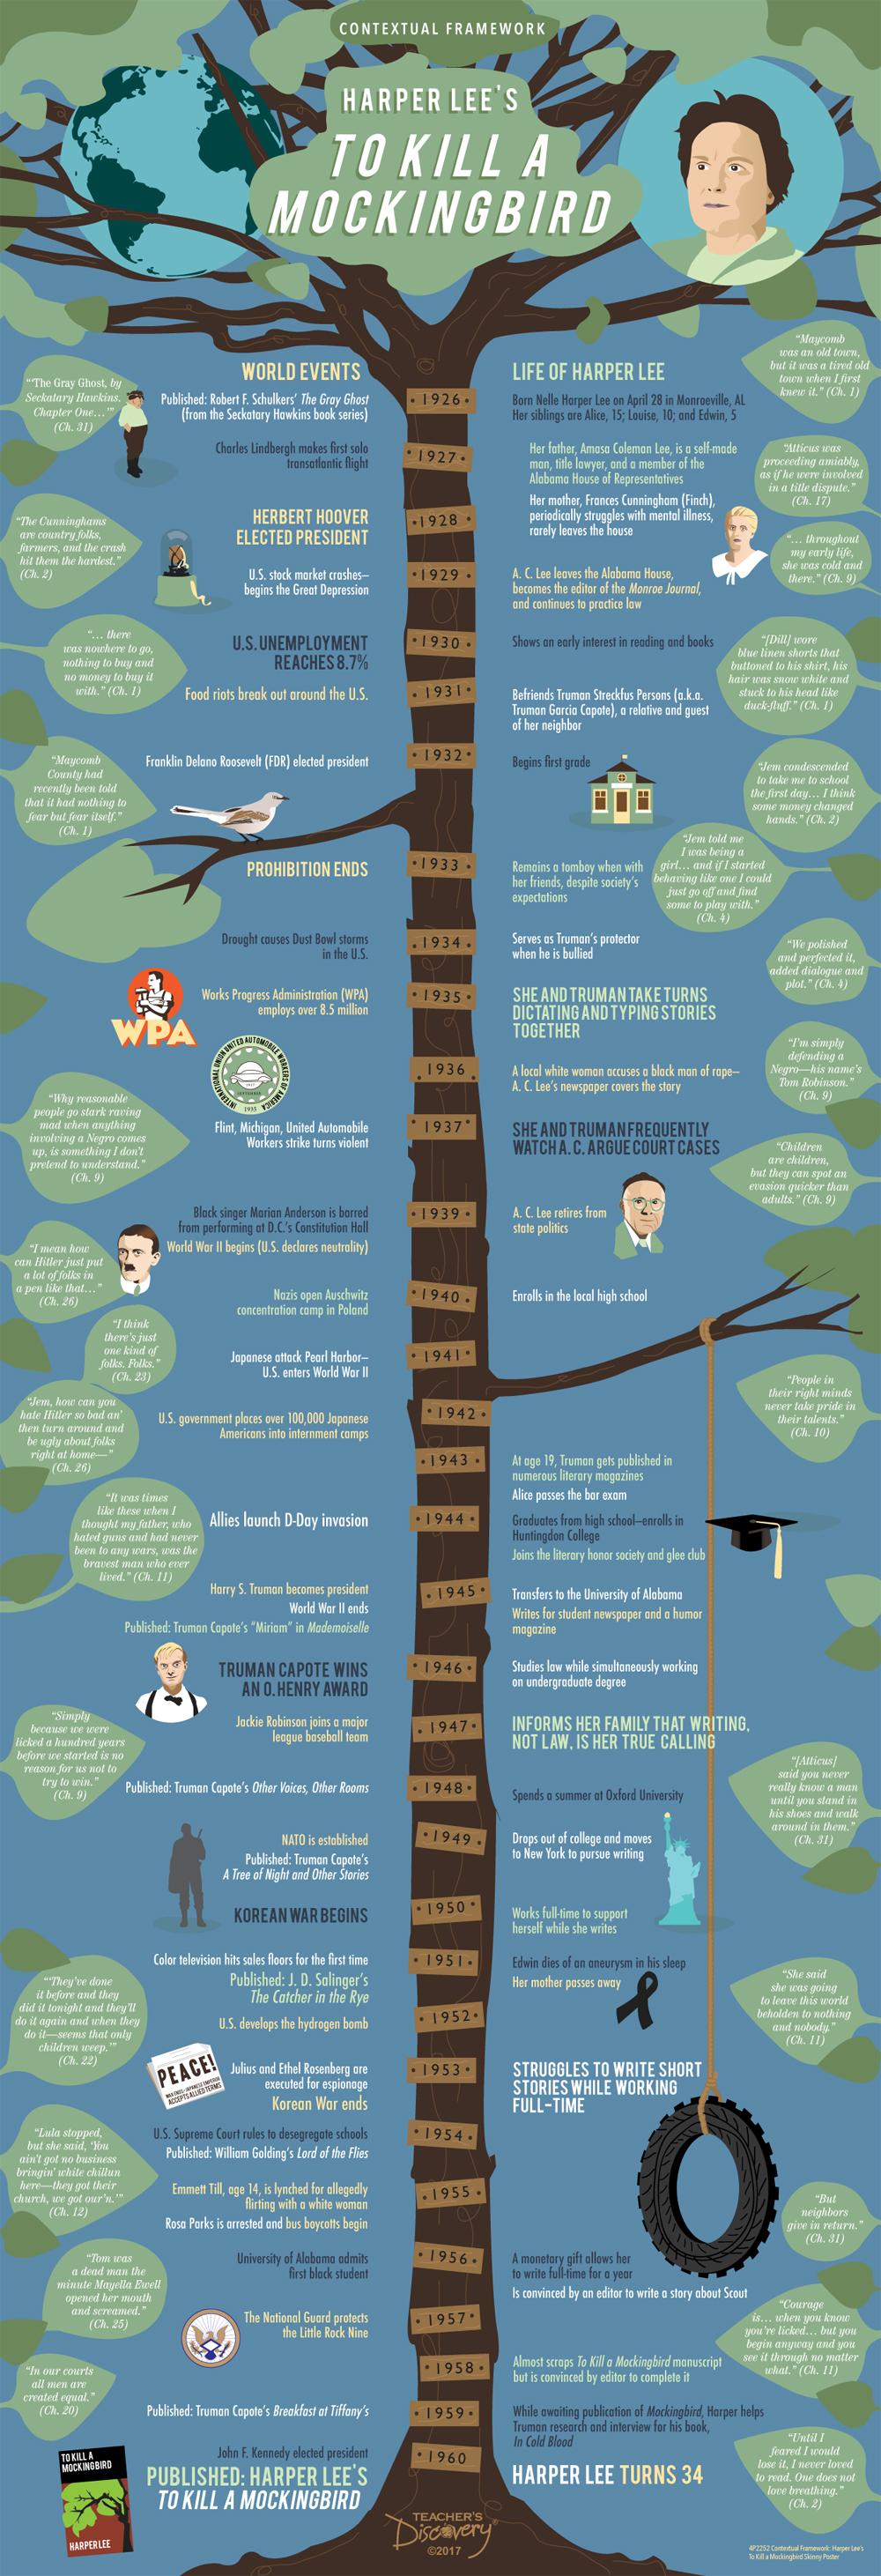 Contextual Framework: Harper Lee's To Kill a Mockingbird Skinny Poster